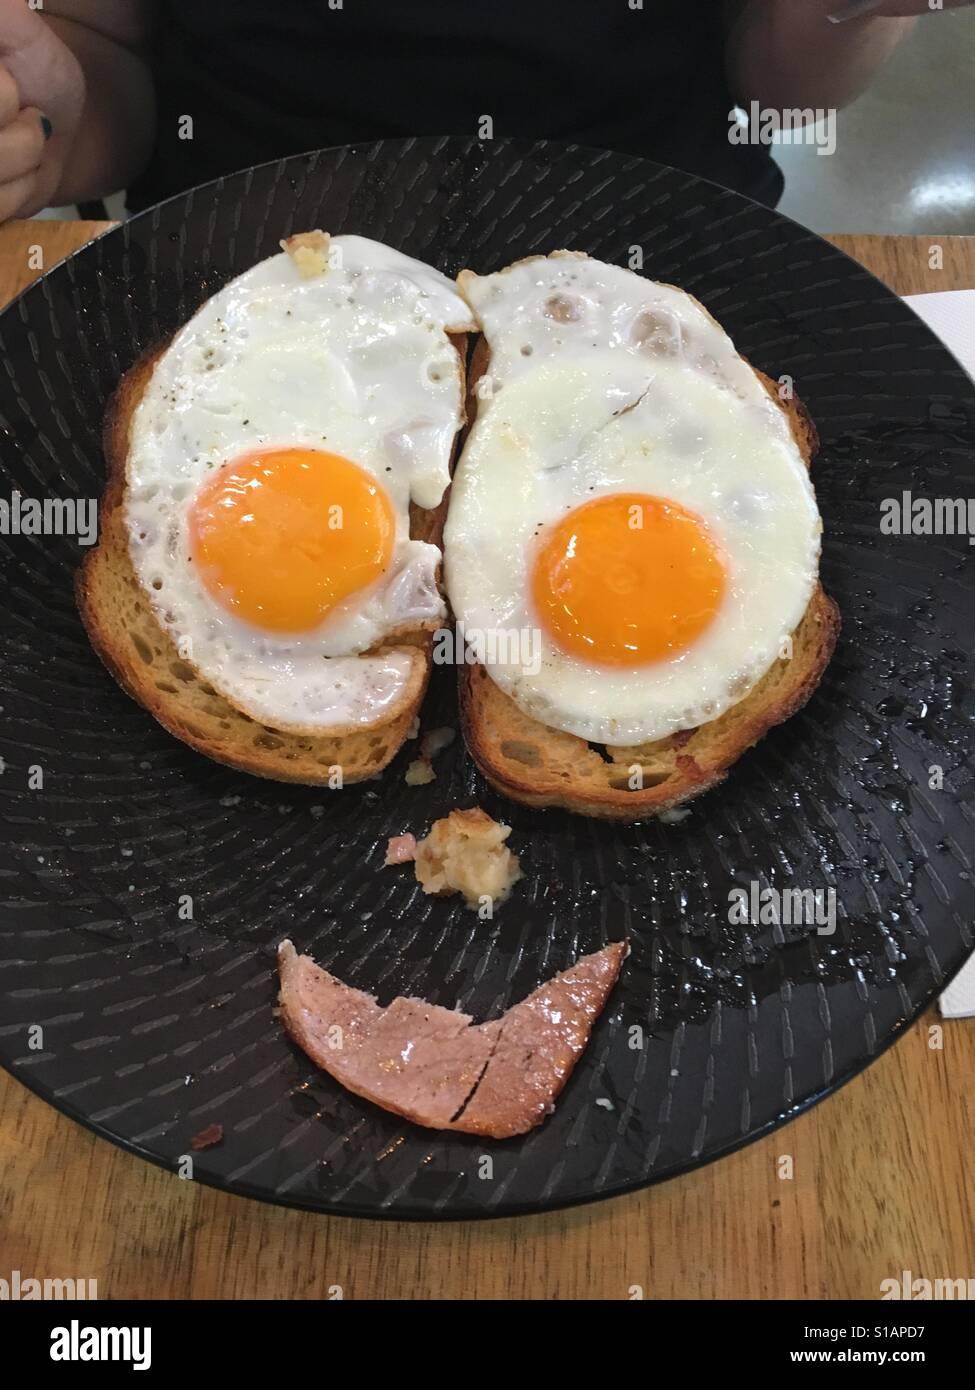 Smilin' huevos para desayunar Foto de stock